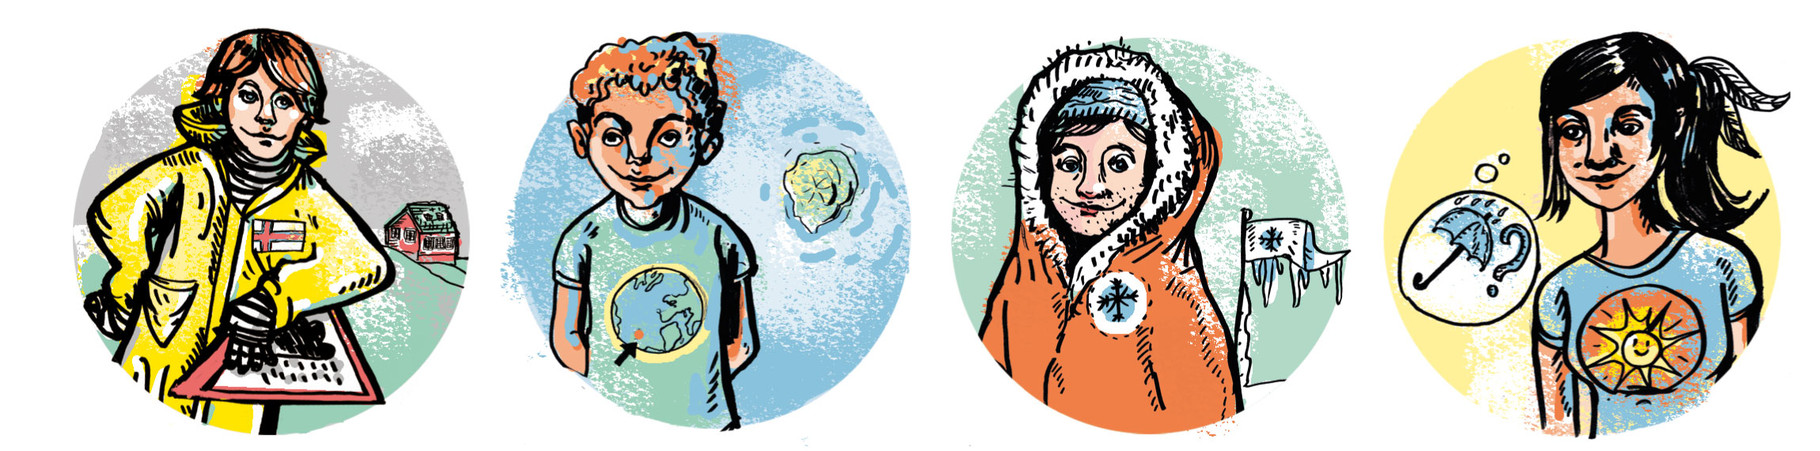 Extremes Klima, Illustration Leitartikel energy forum